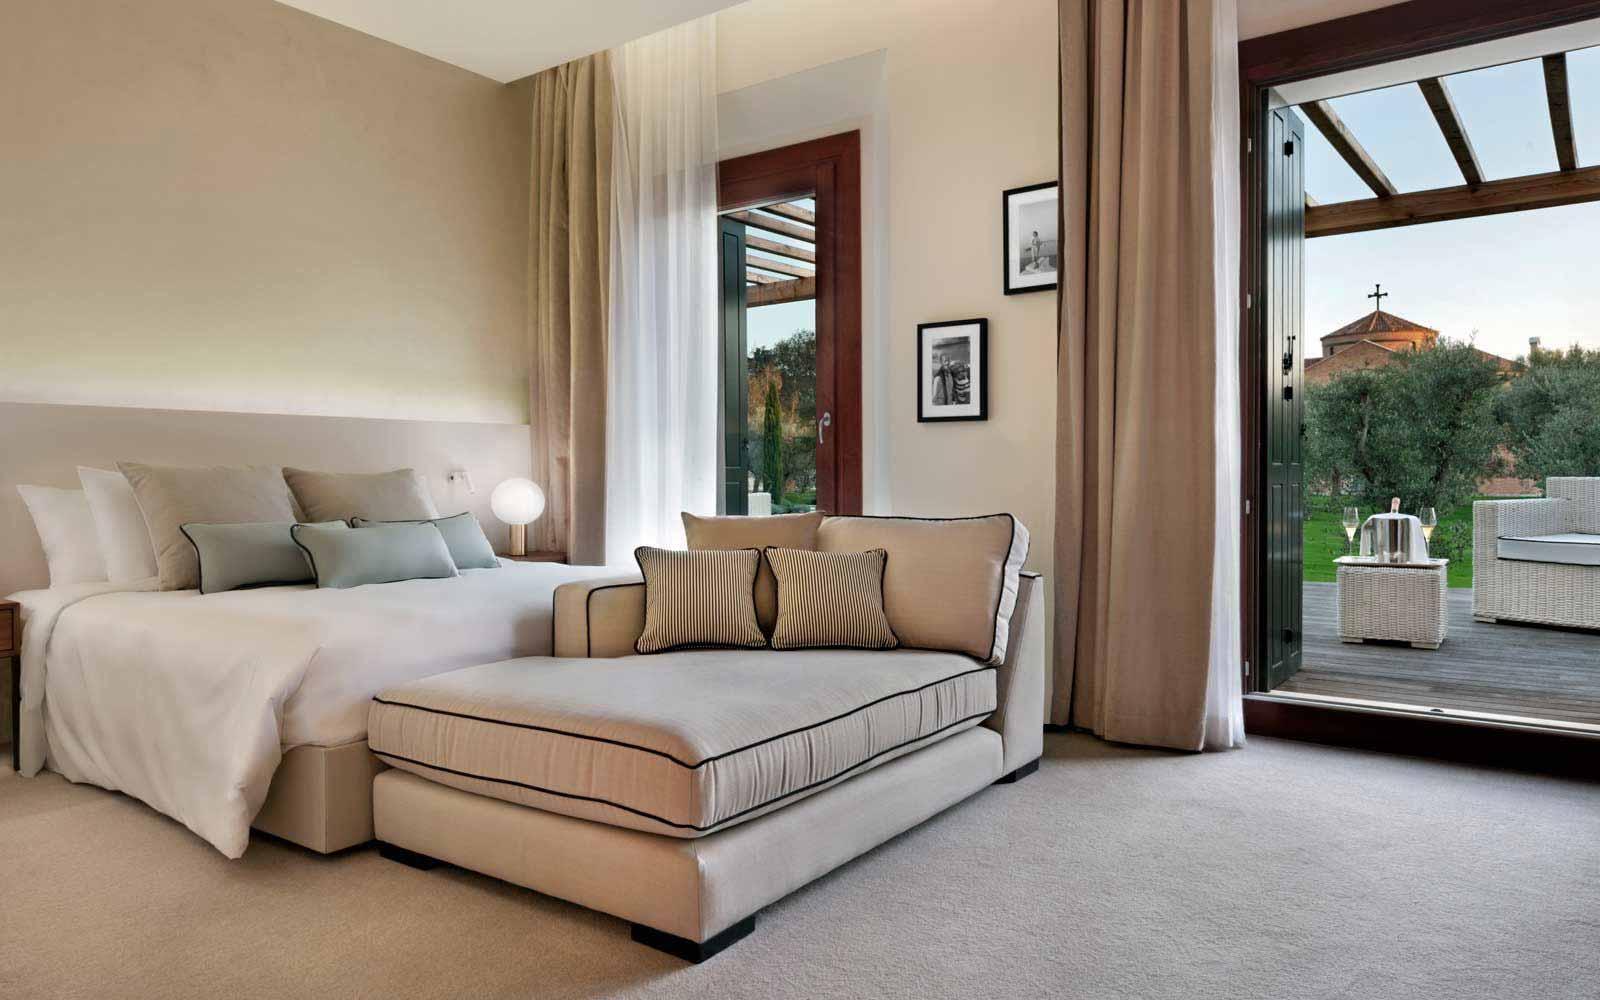 Uliveto Deluxe Room at the JW Marriott Venice Resort & Spa